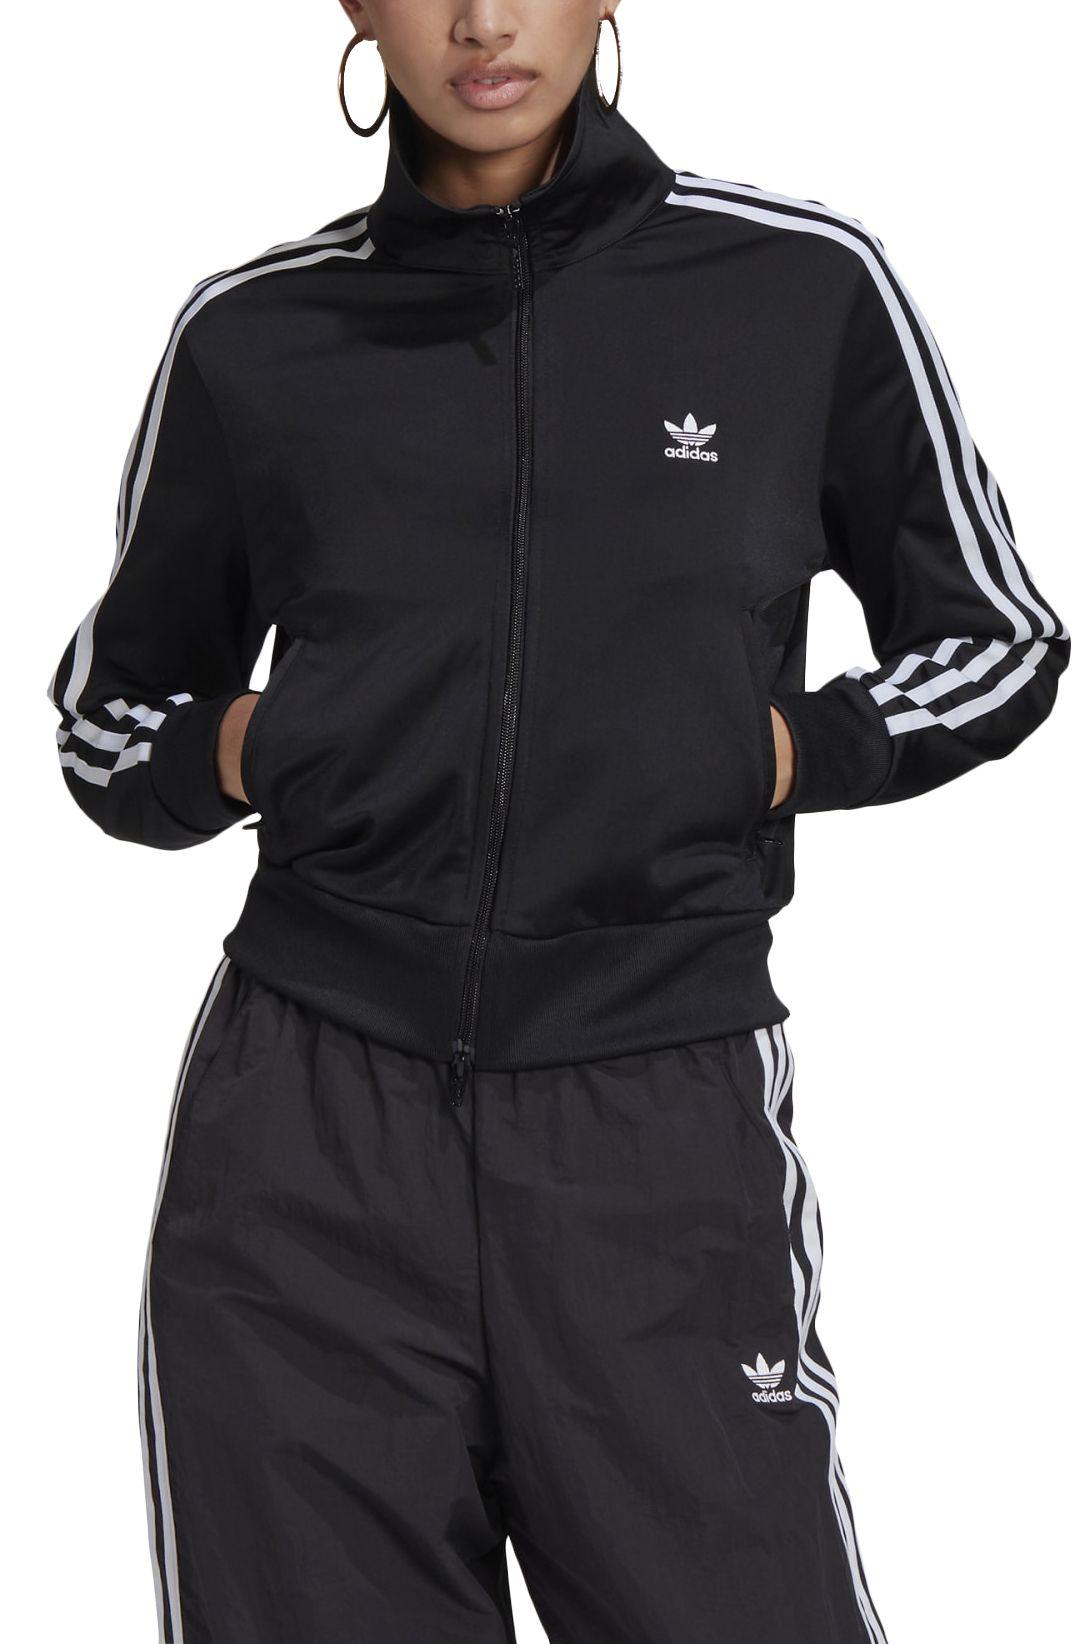 Adidas Coat FIREBIRD TT PB Black